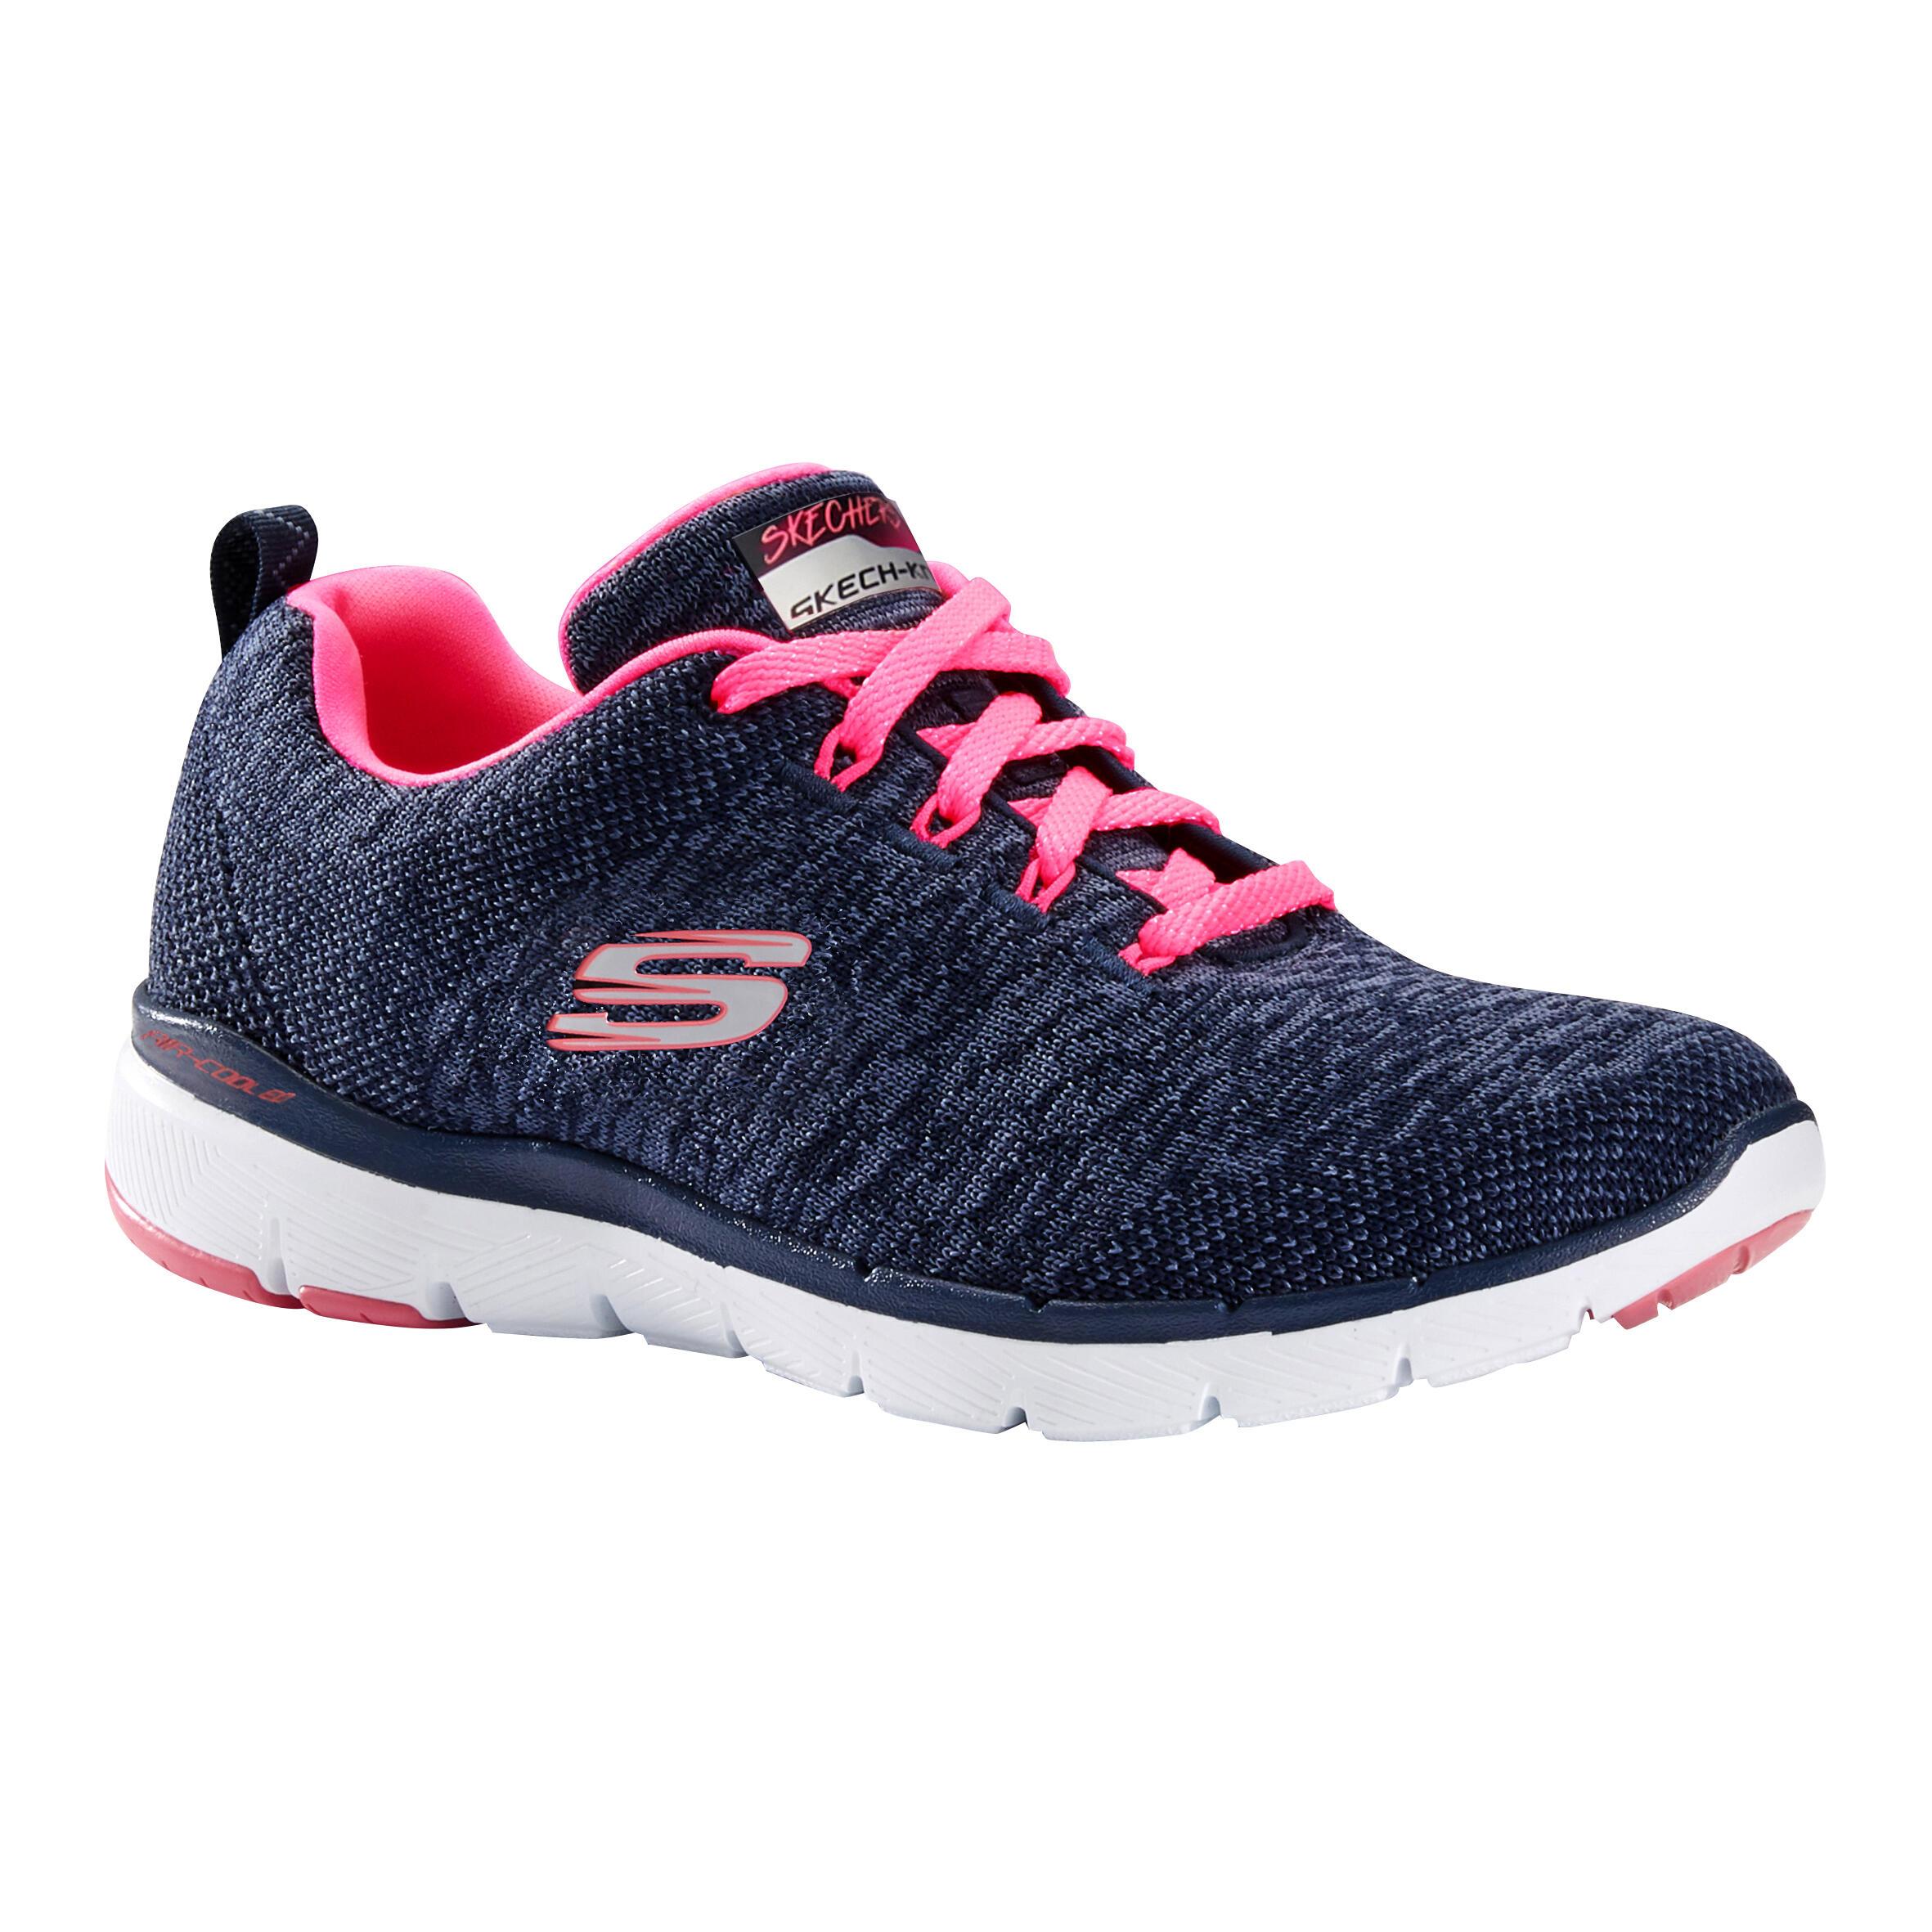 SKECHERS Chaussures marche sportive femme Flex Appeal bleu / rose - SKECHERS - 39